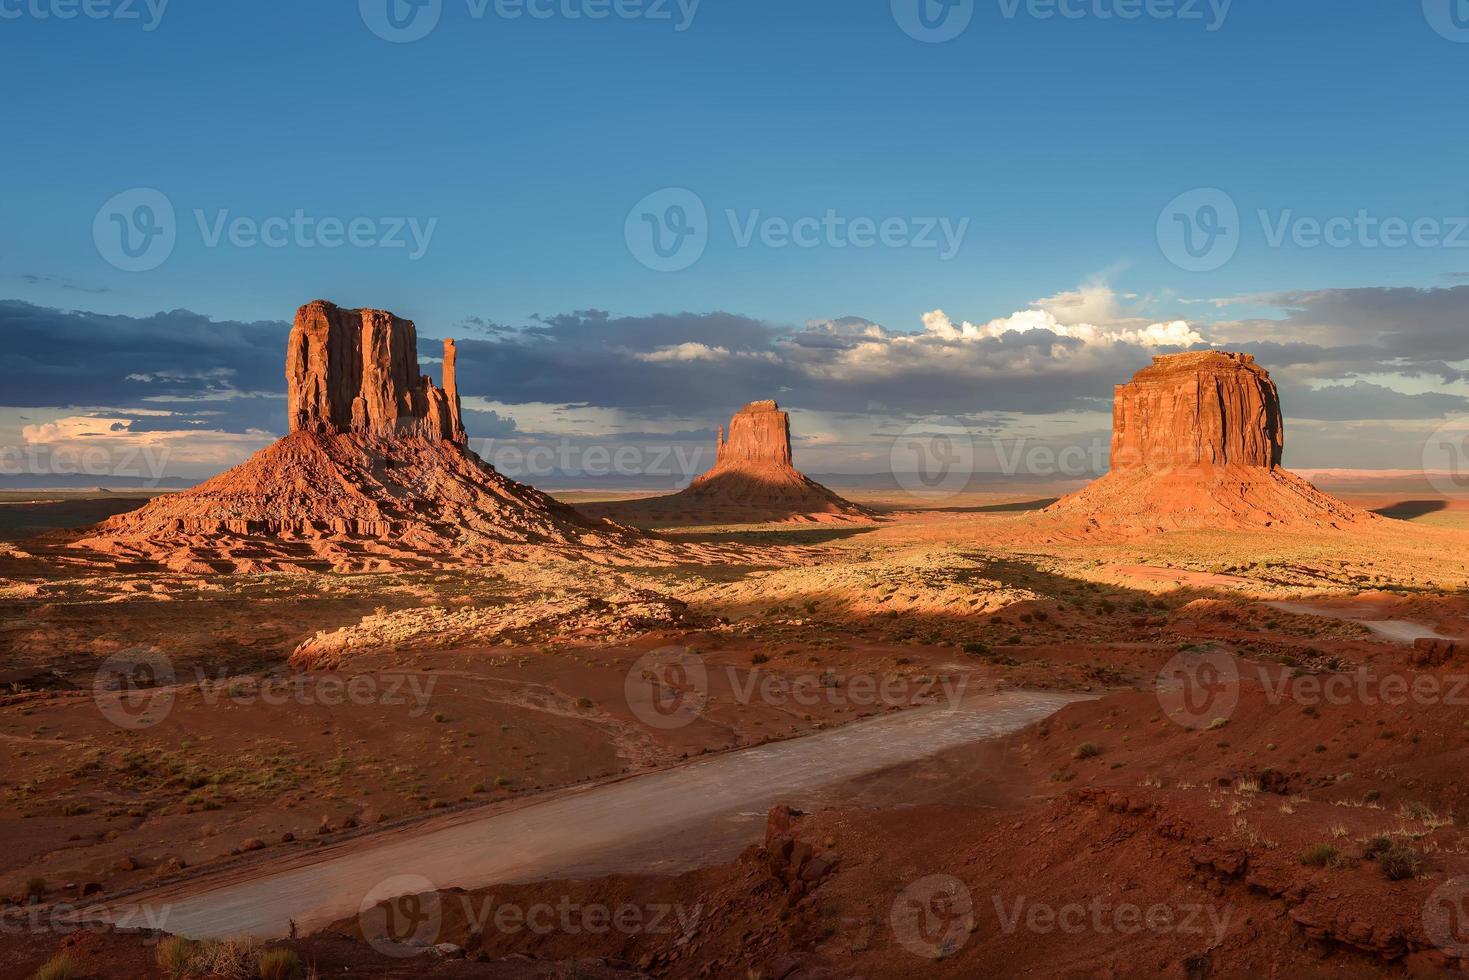 drie rotsen in de woestijn, monument valley, utah, arizona, usa foto